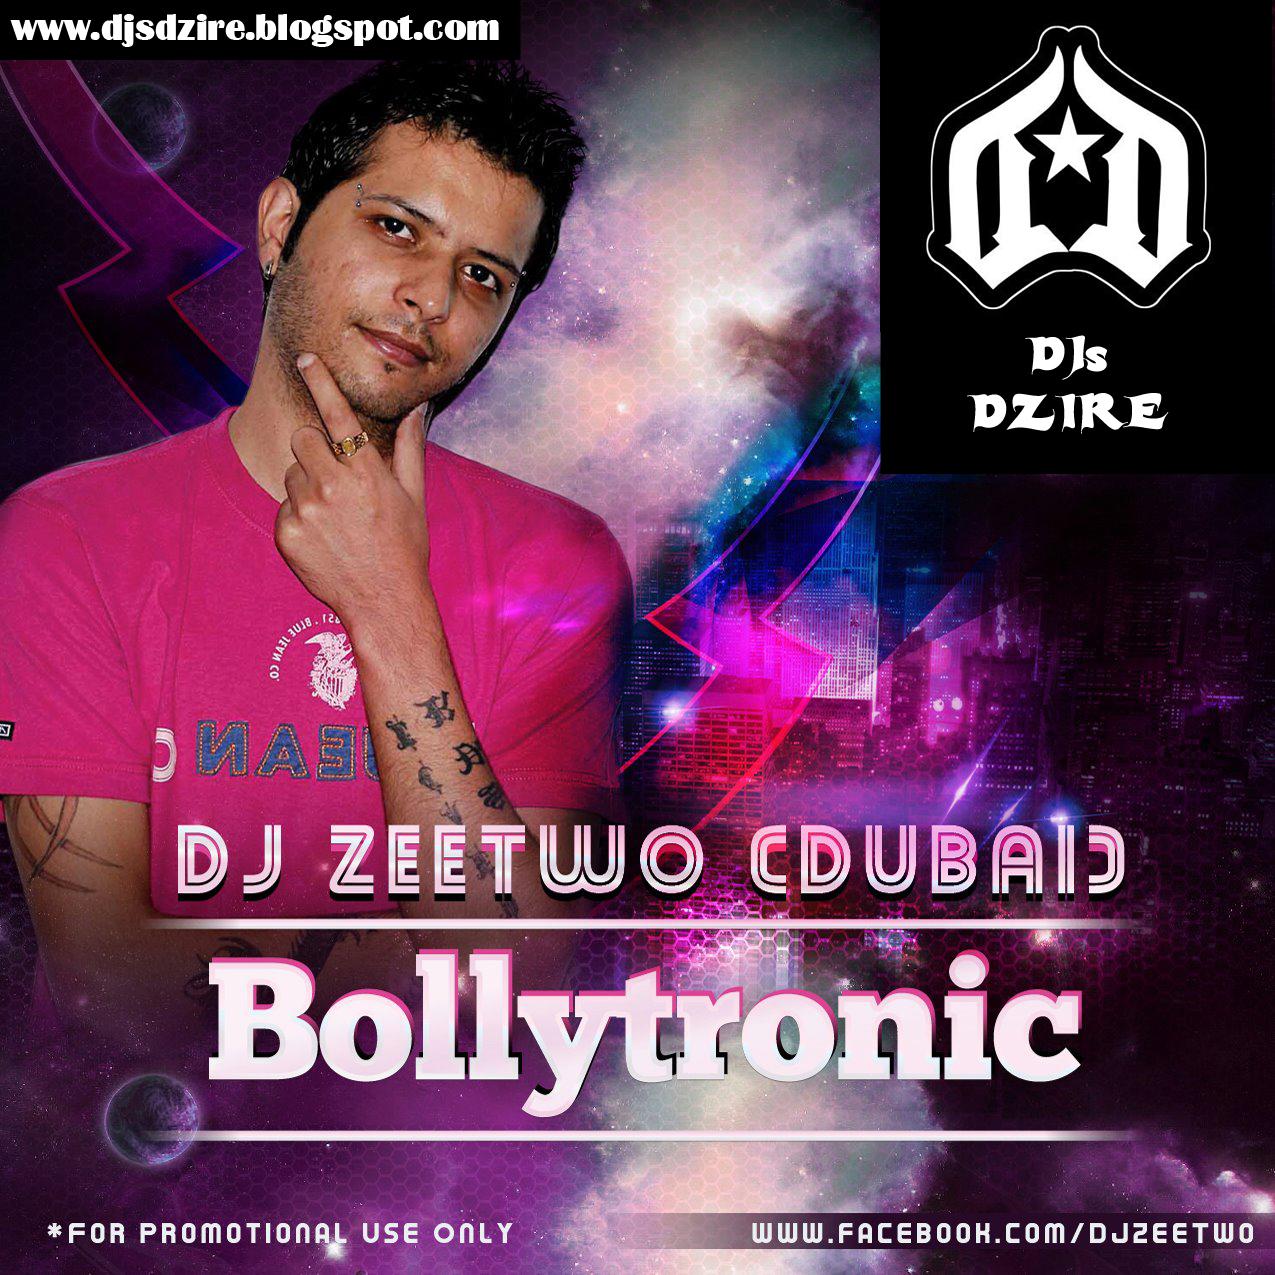 Chahunga Main Tujhe Hardam Albums Name: Bollytronic (2012)